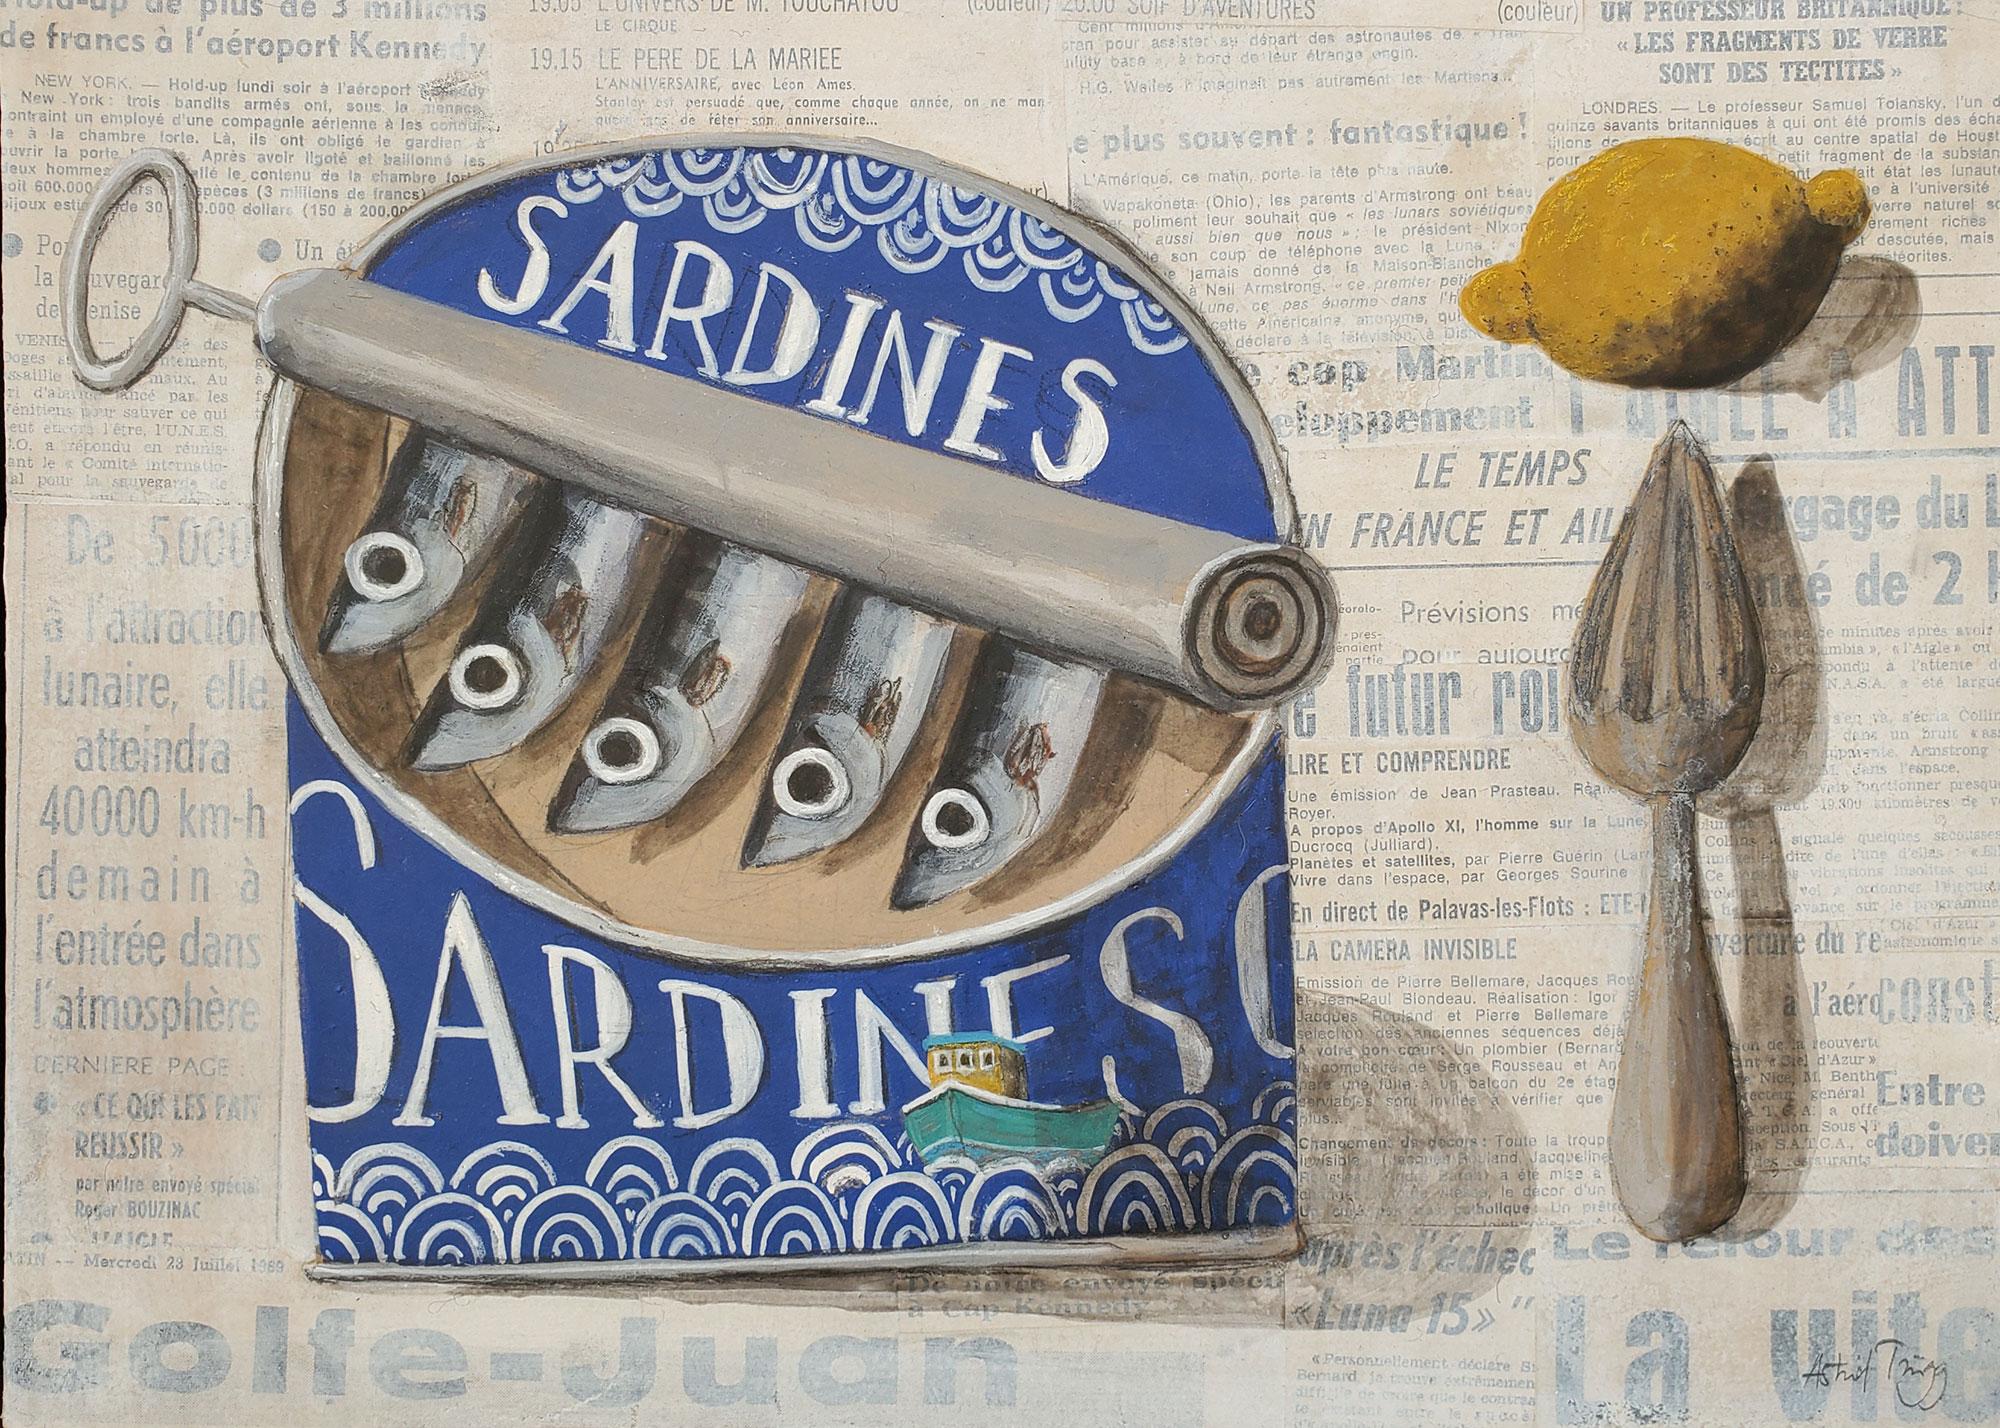 Astrid Trugg Sardines